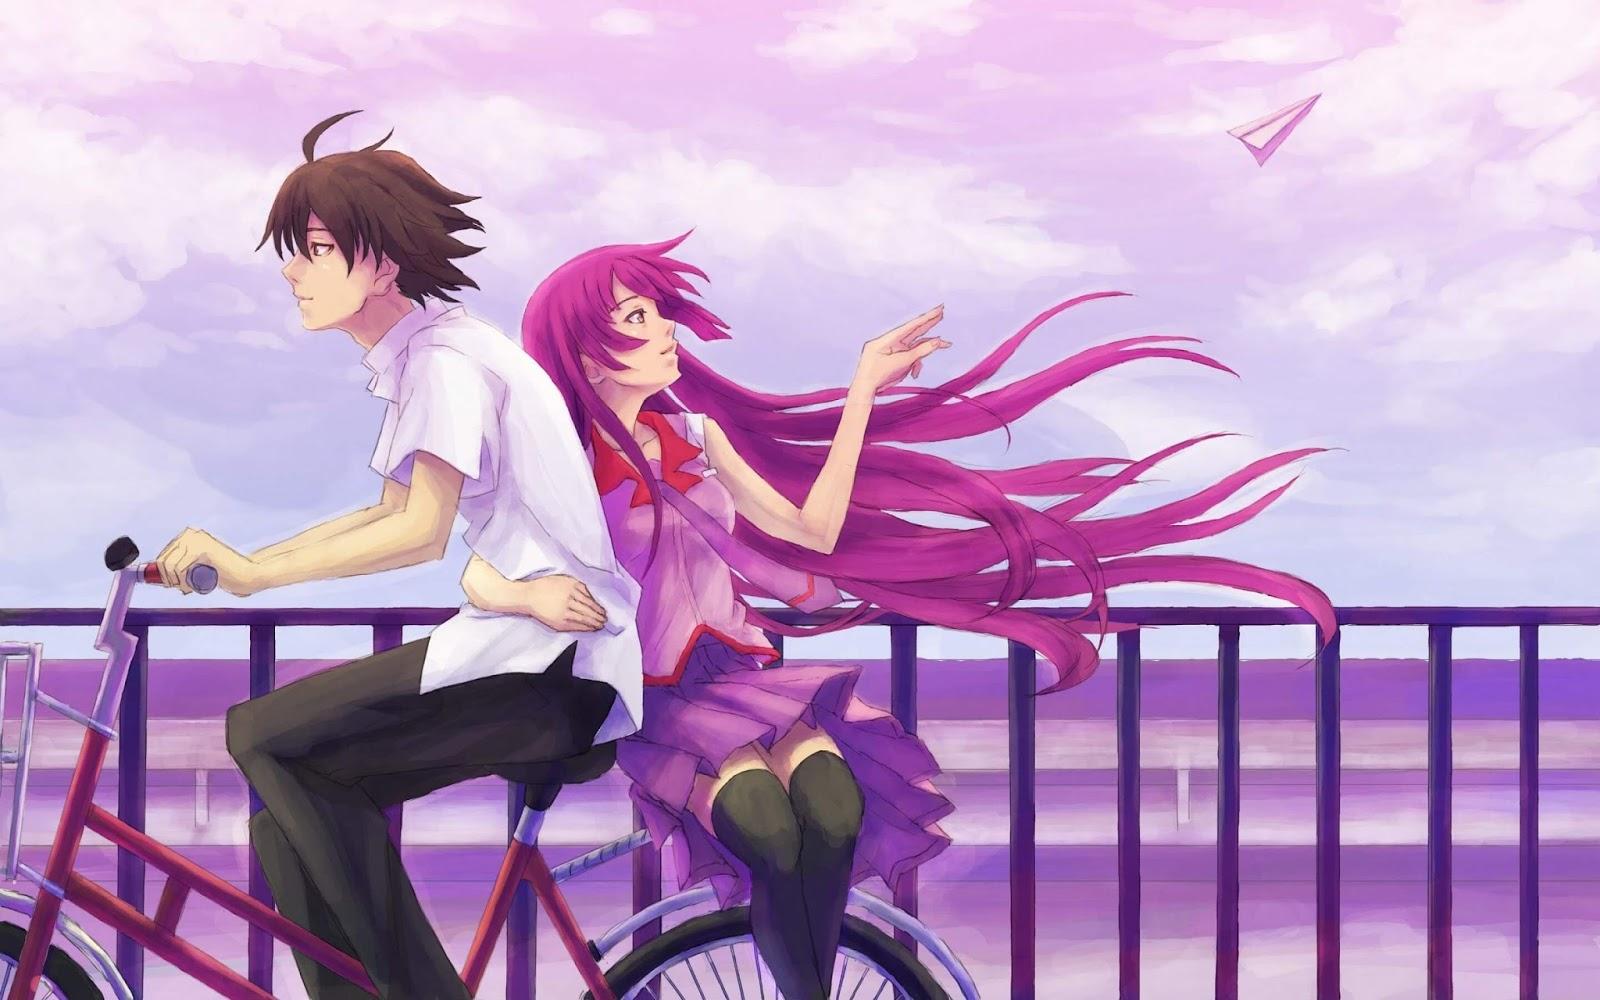 Koyomimonogatari [BD] Sub Indo : Episode 1-12 END | Anime Loker